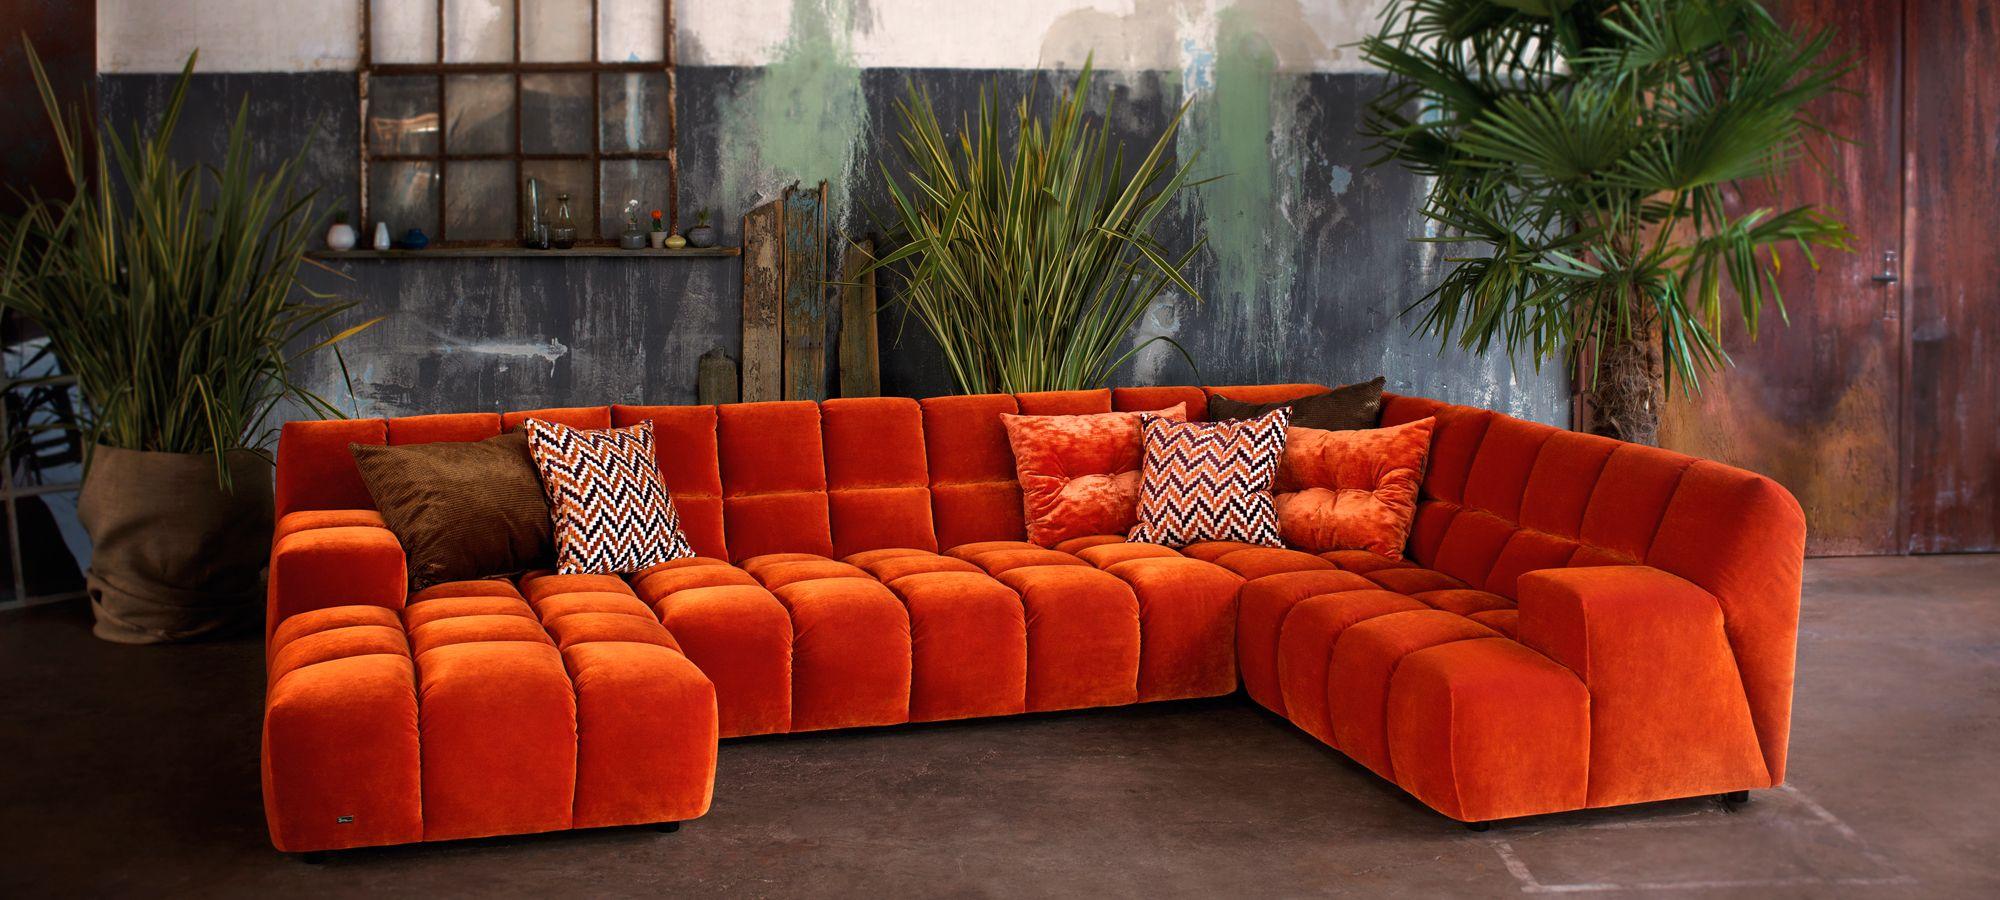 Bretz Ocean Chambre Froide Mobilier De Salon Canape Moderne